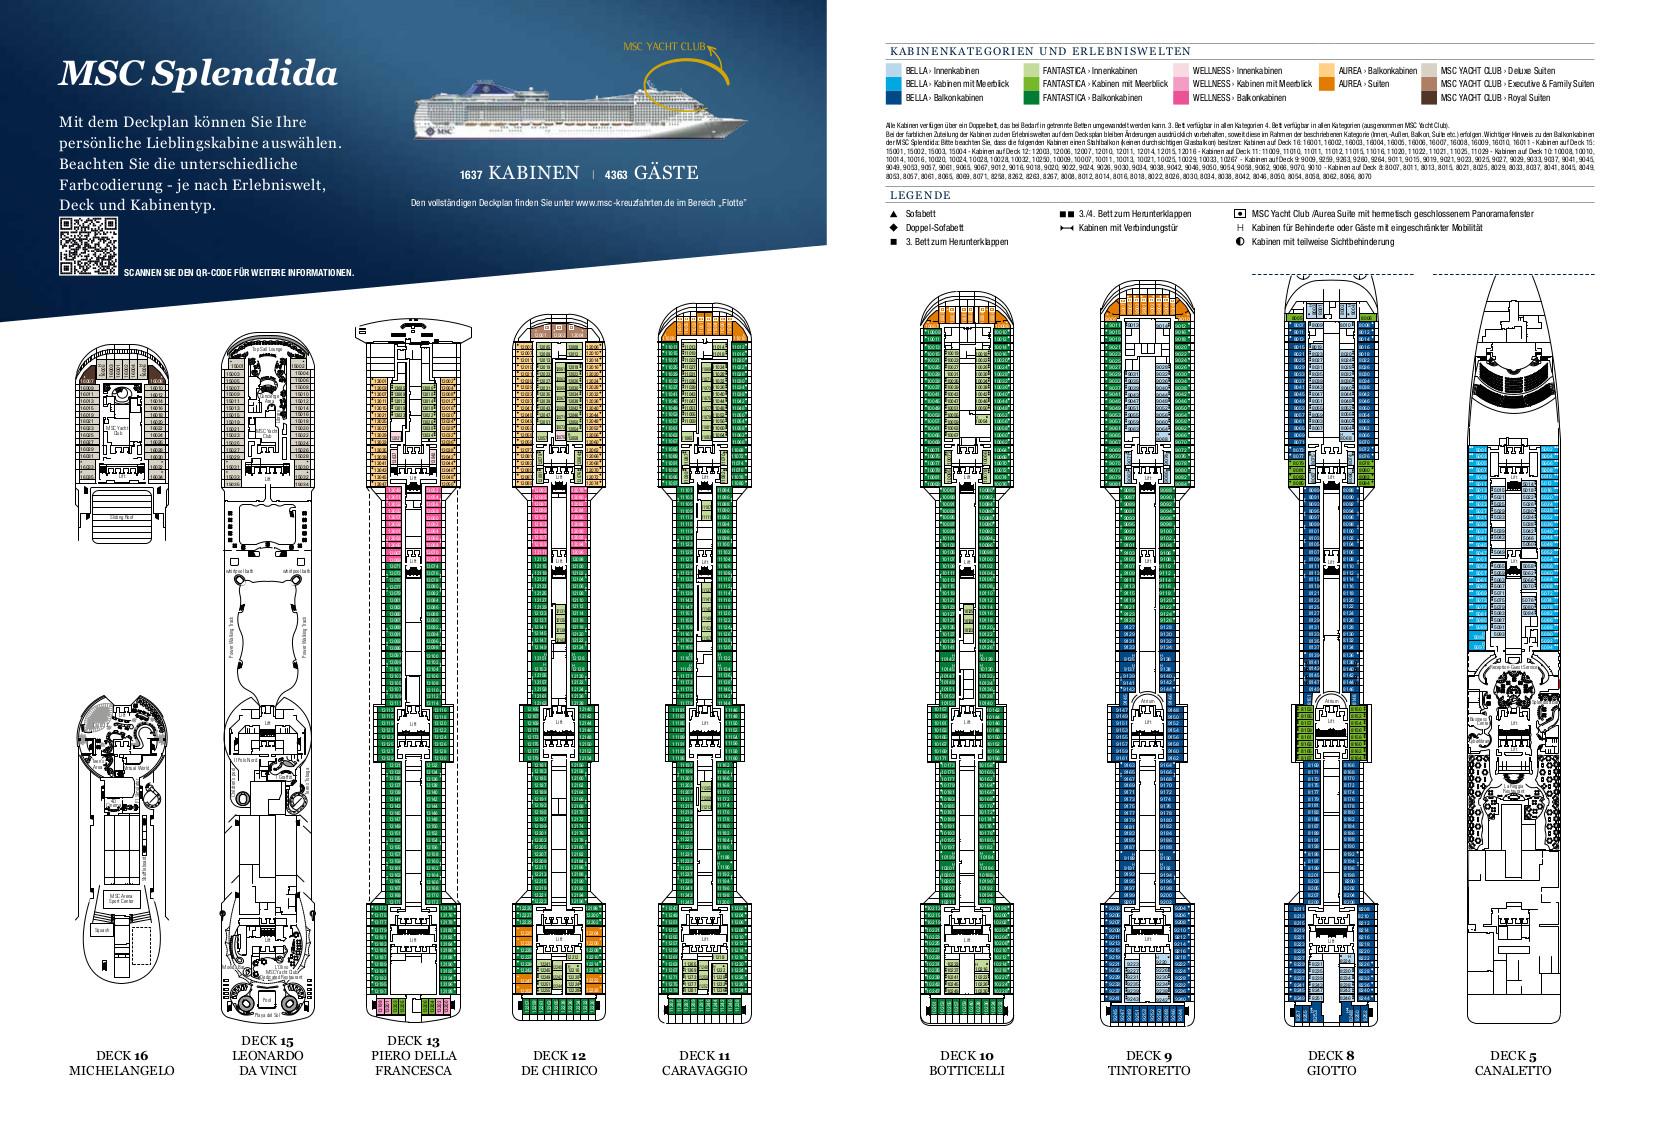 MSC Splendida: Kreuzfahrt online buchen | Schiffs-Urlaub.de